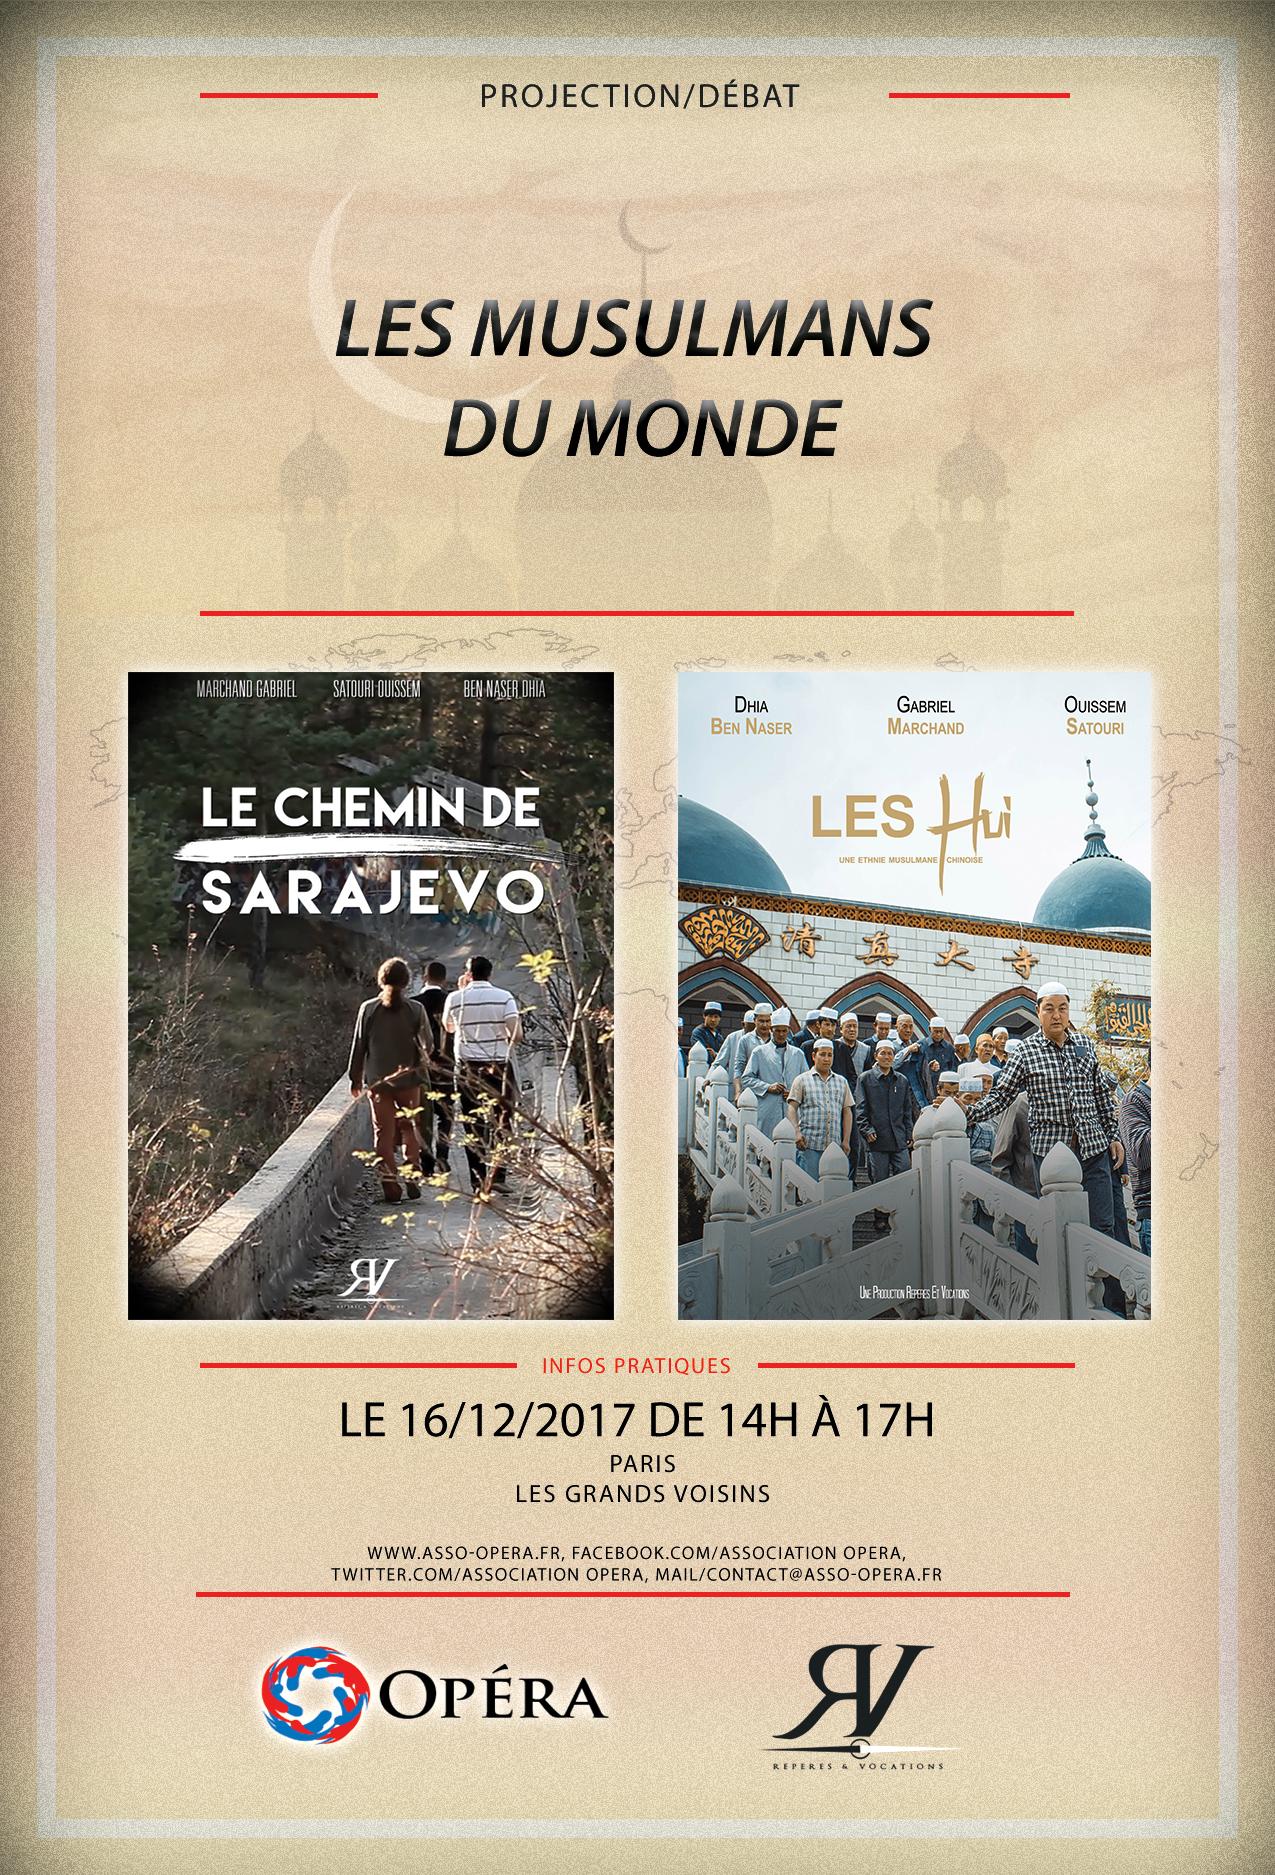 https://www.saphirnews.com/agenda/Projection-debat-Les-musulmans-du-monde_ae534576.html